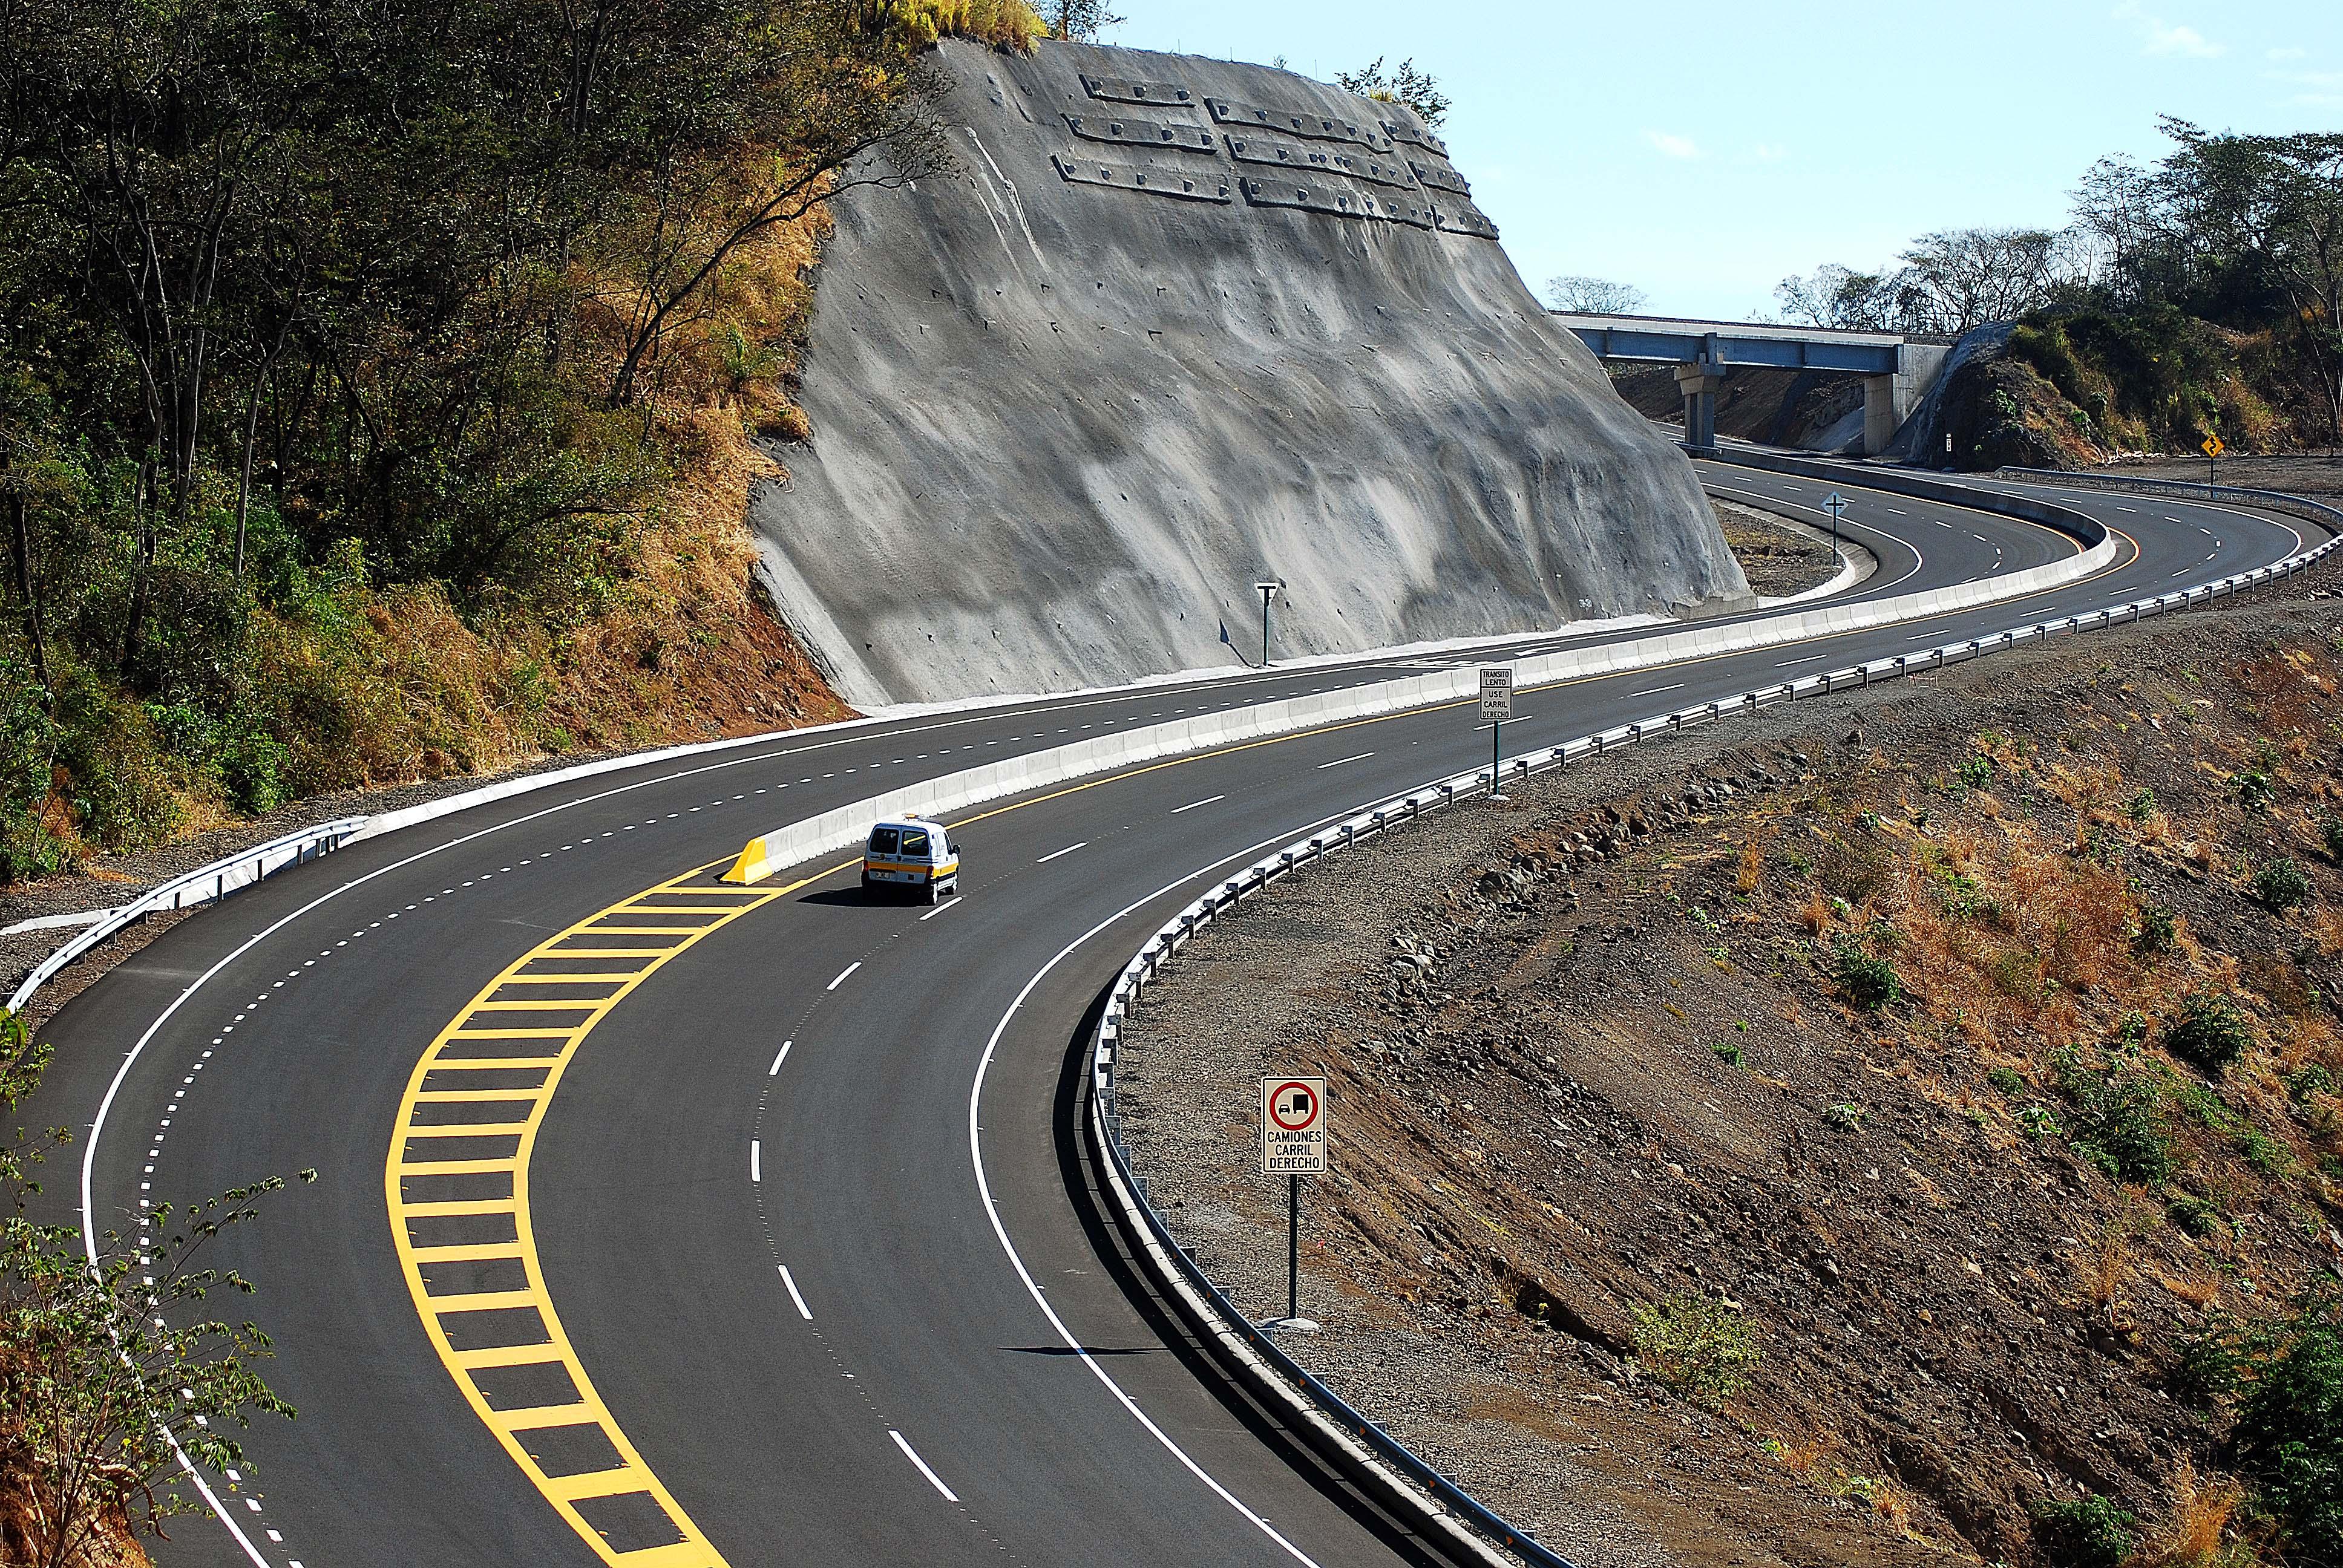 Sol motorway between San José and Caldera